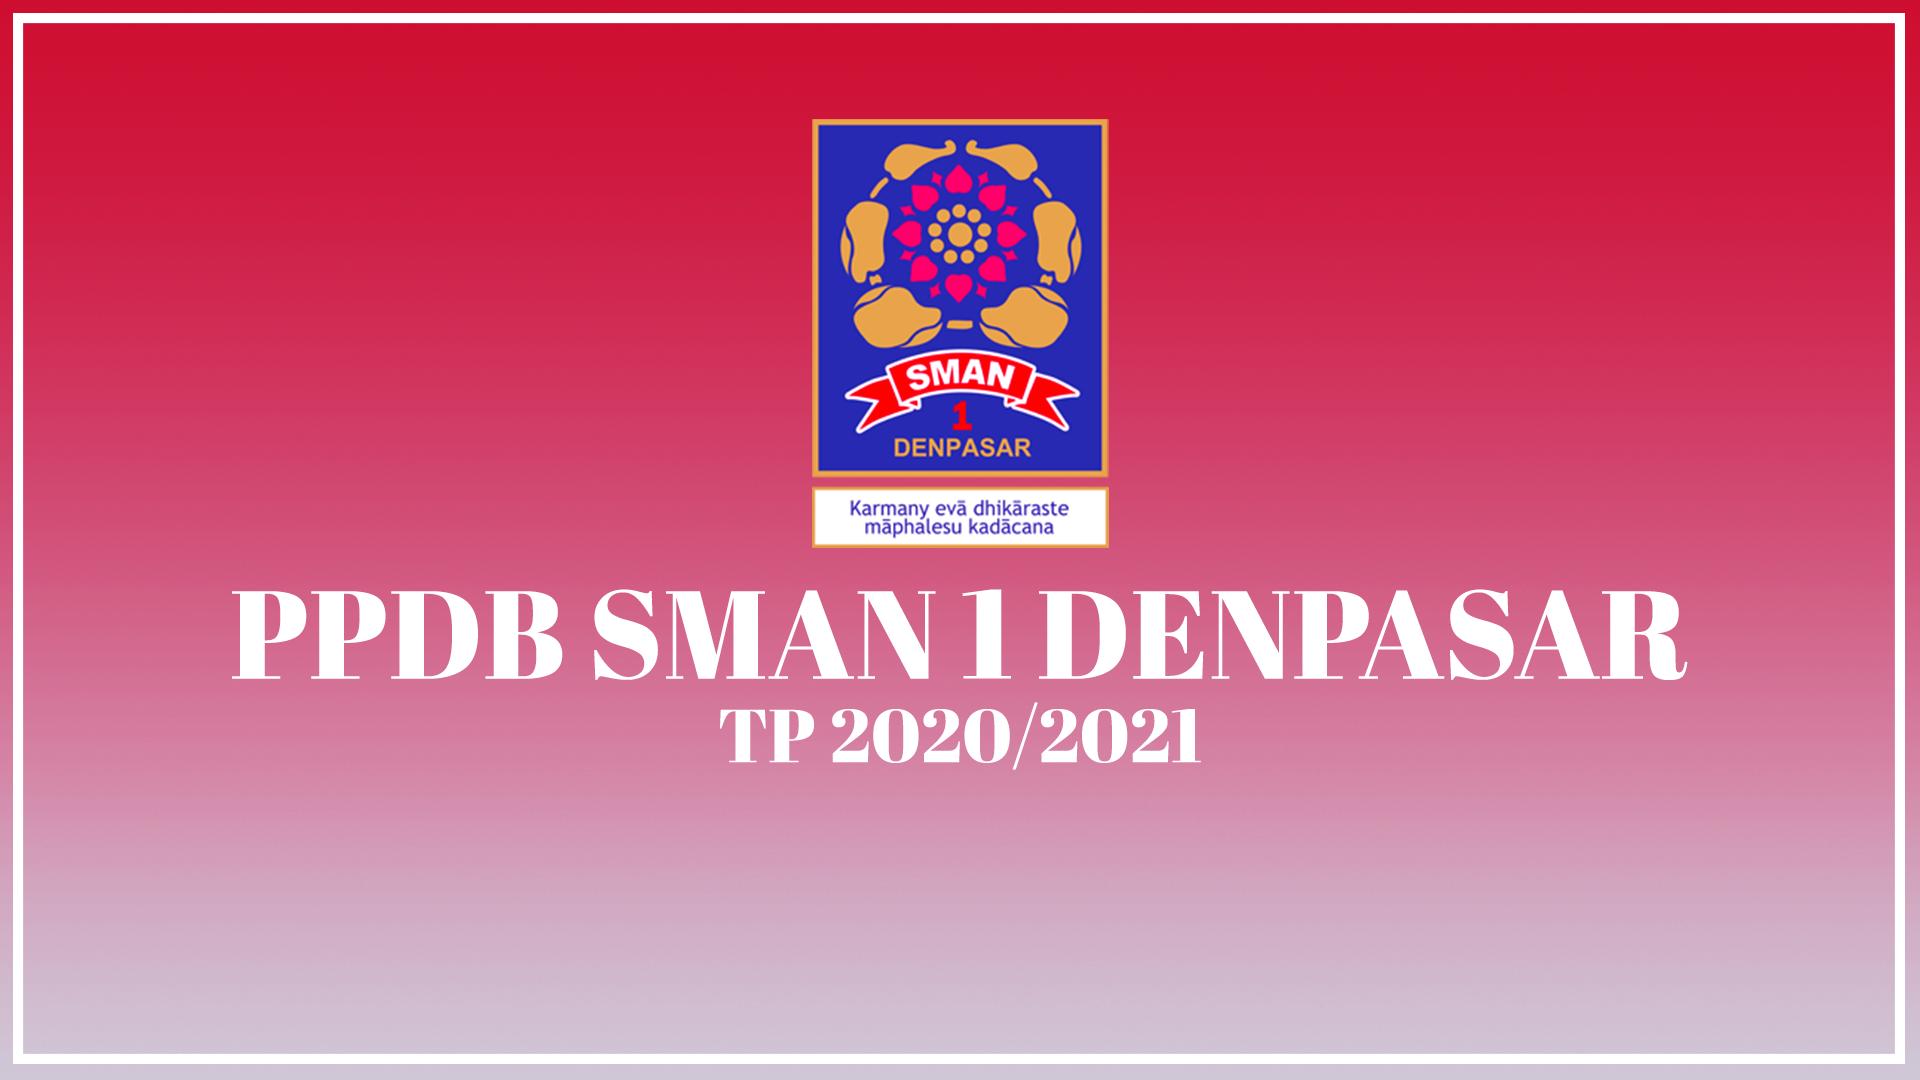 Pengumuman Hasil Seleksi PPDB SMAN 1 Denpasar 2020/2021